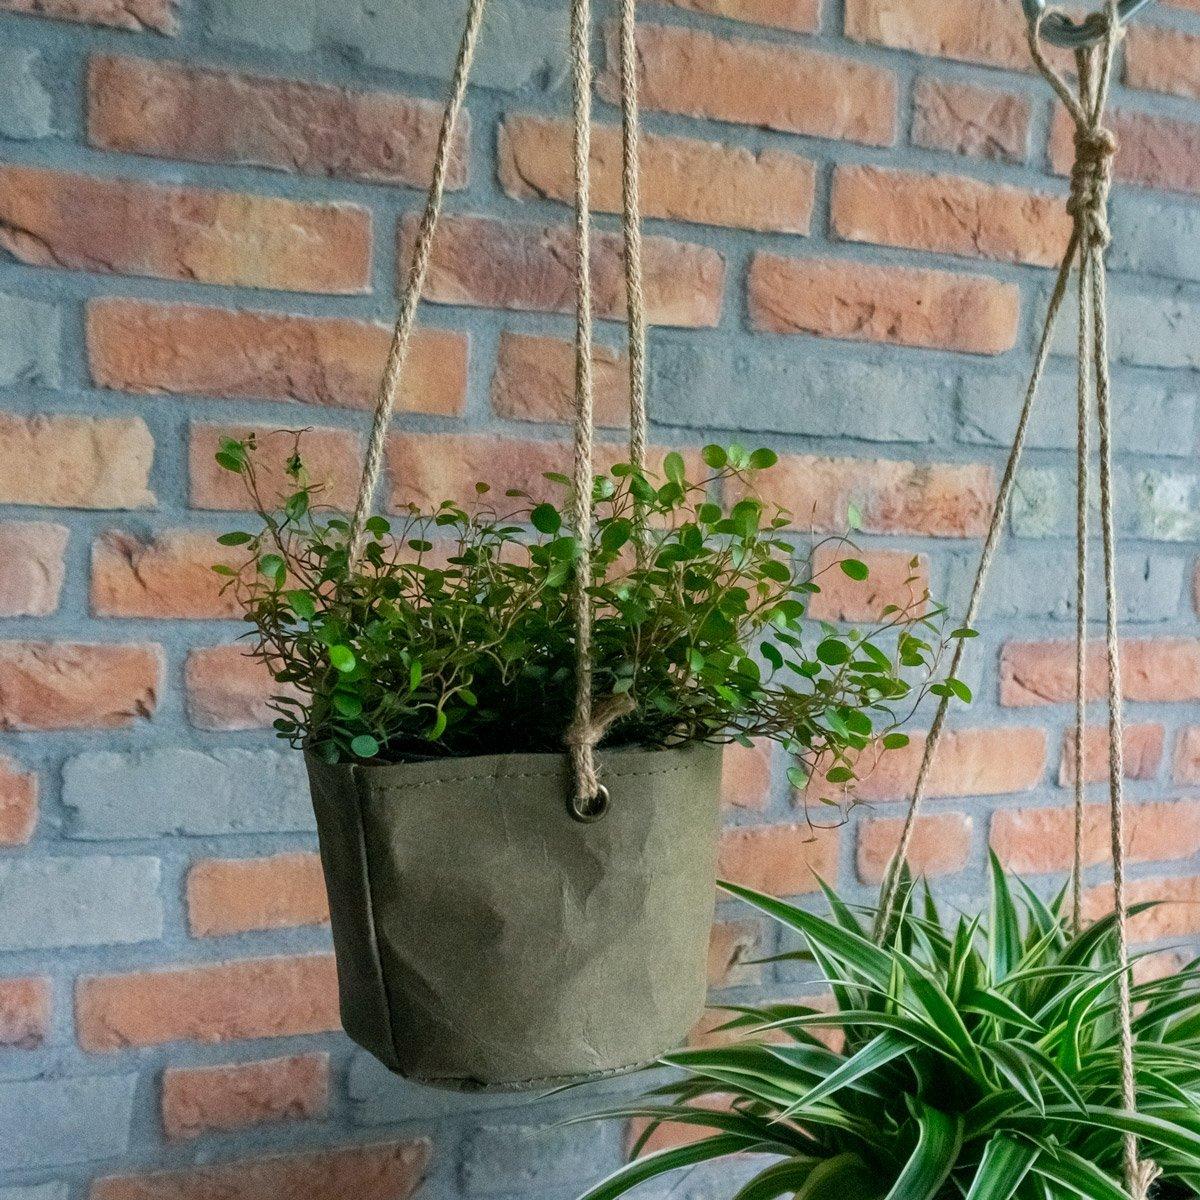 Plant & Bloempotten